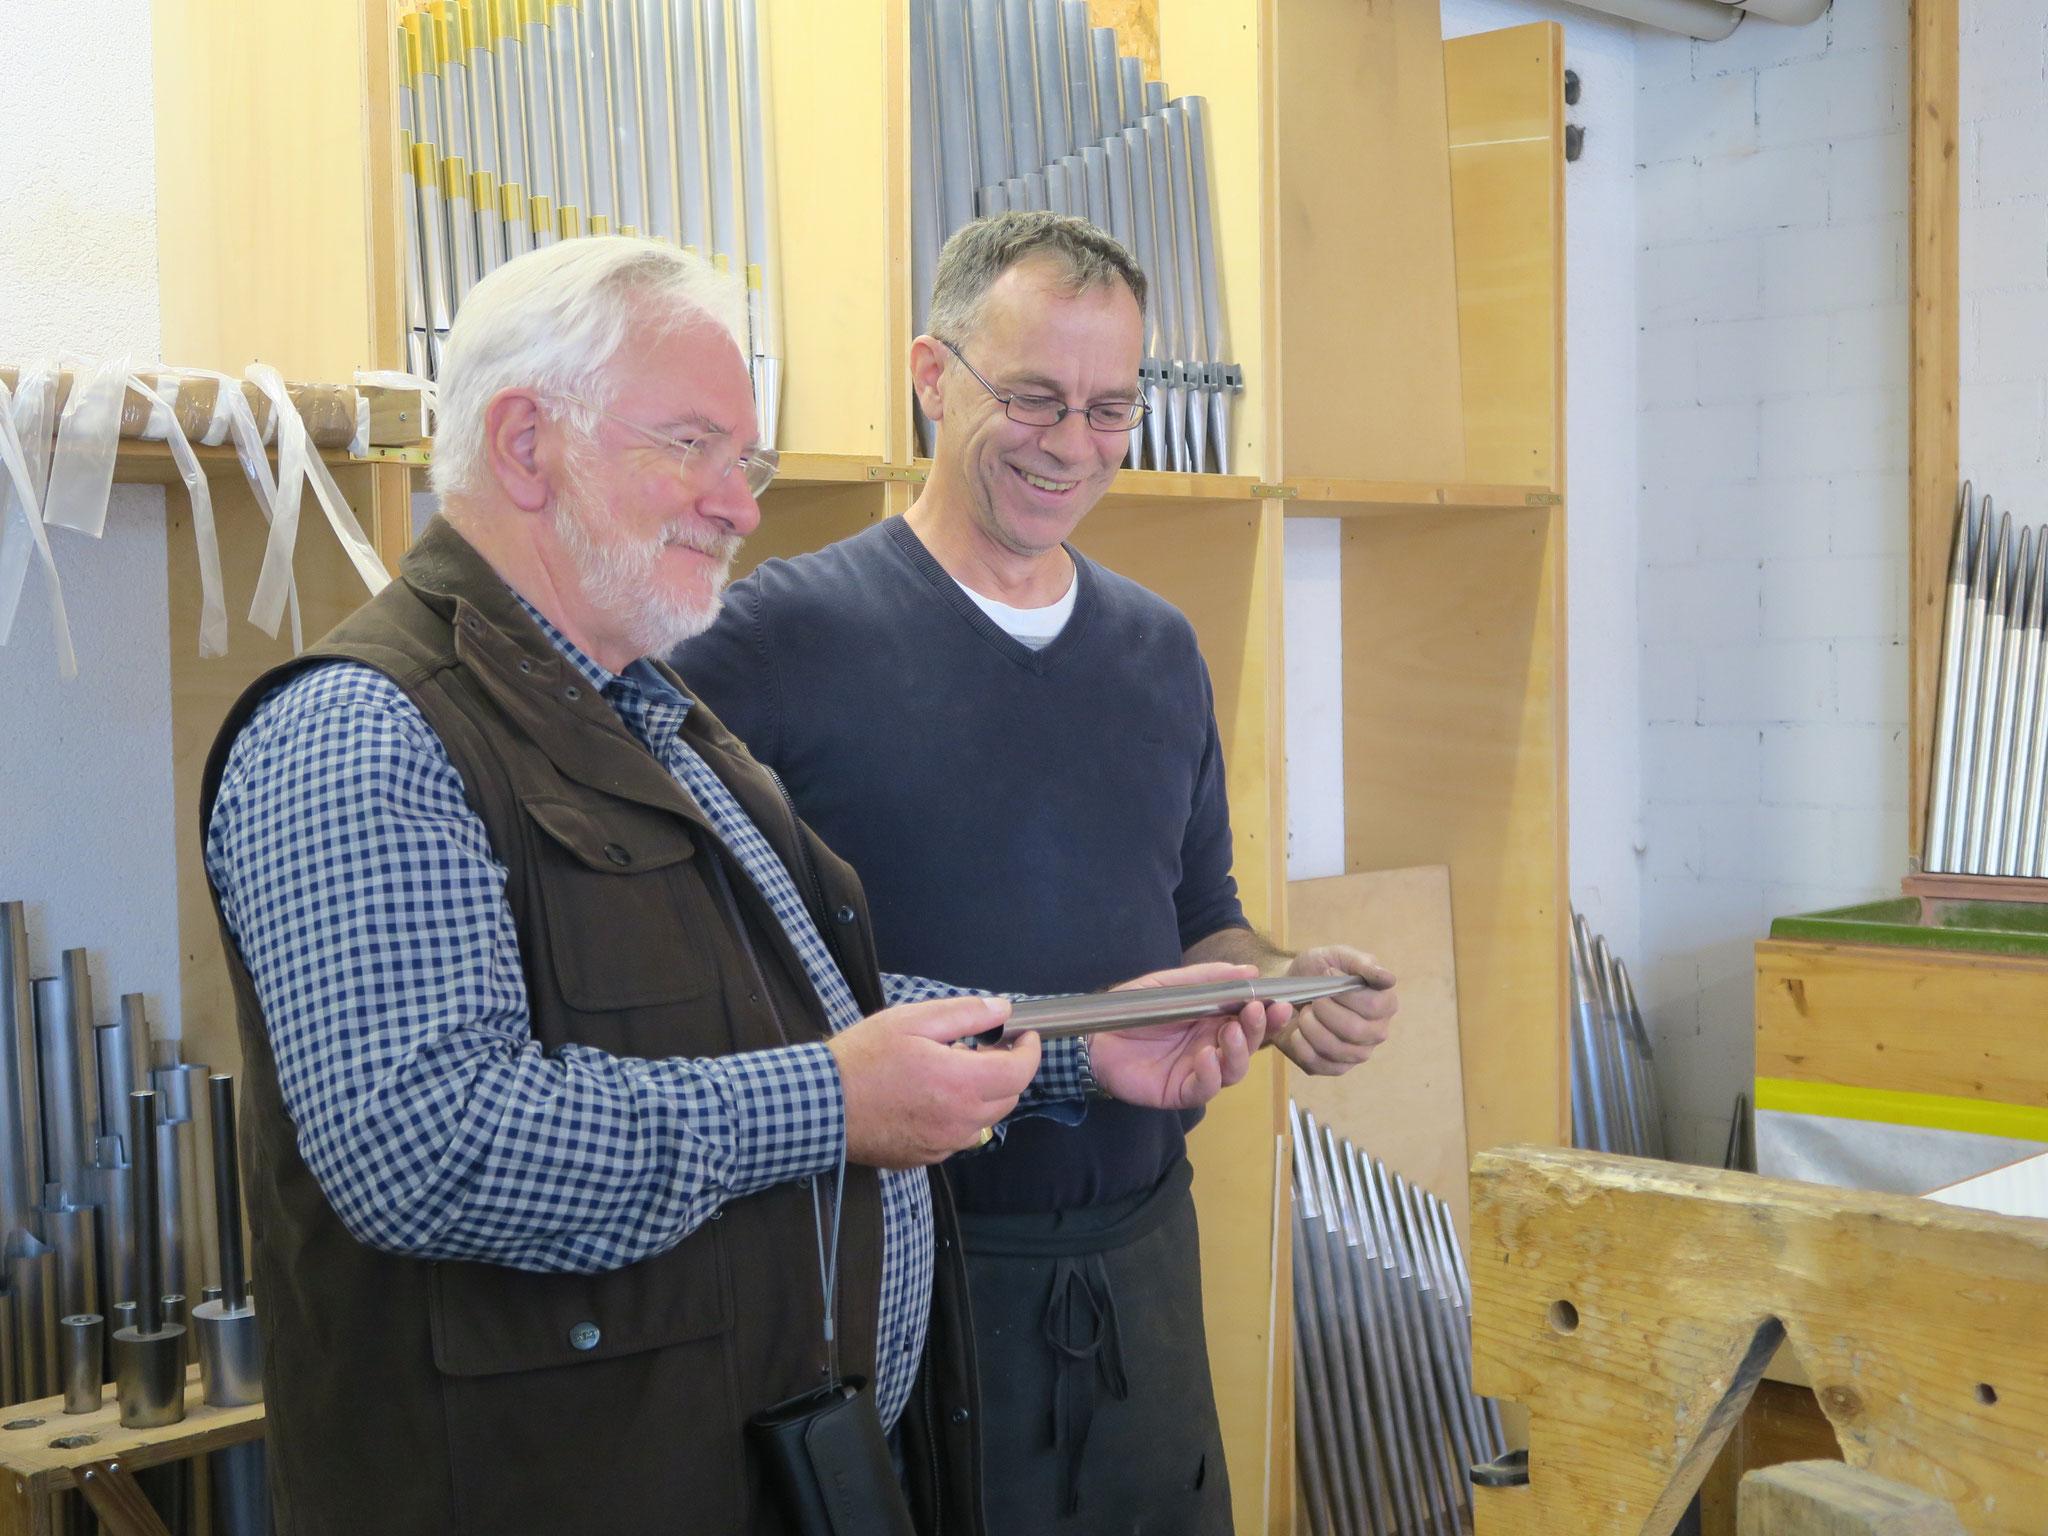 Marco übergibt die soeben gefertigte Pfeife an den Präsidenten Peter X. Bürgisser